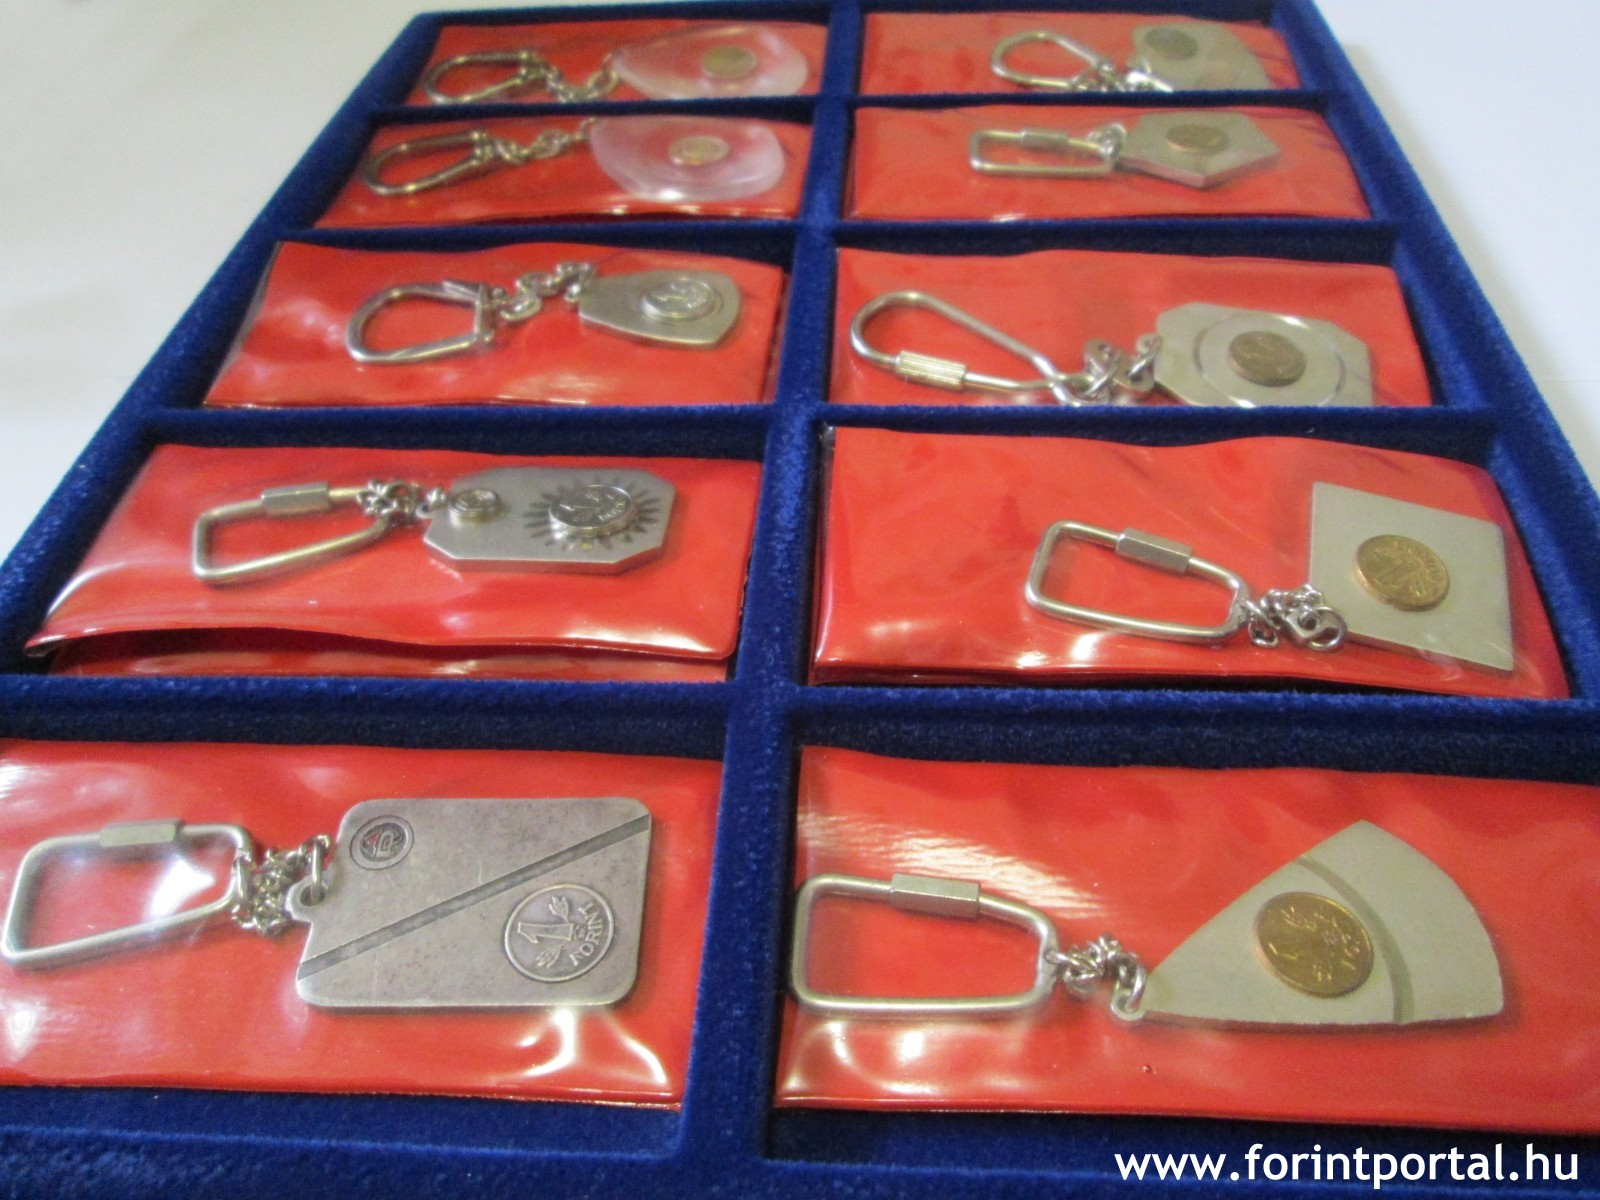 http://www.forintportal.hu/hirek/mini-1-forintos-kulcstartok/mini-1-forintos-kulcstartok-apv-allami-penzvero-regi-kulcstarto-1ft_03.jpg